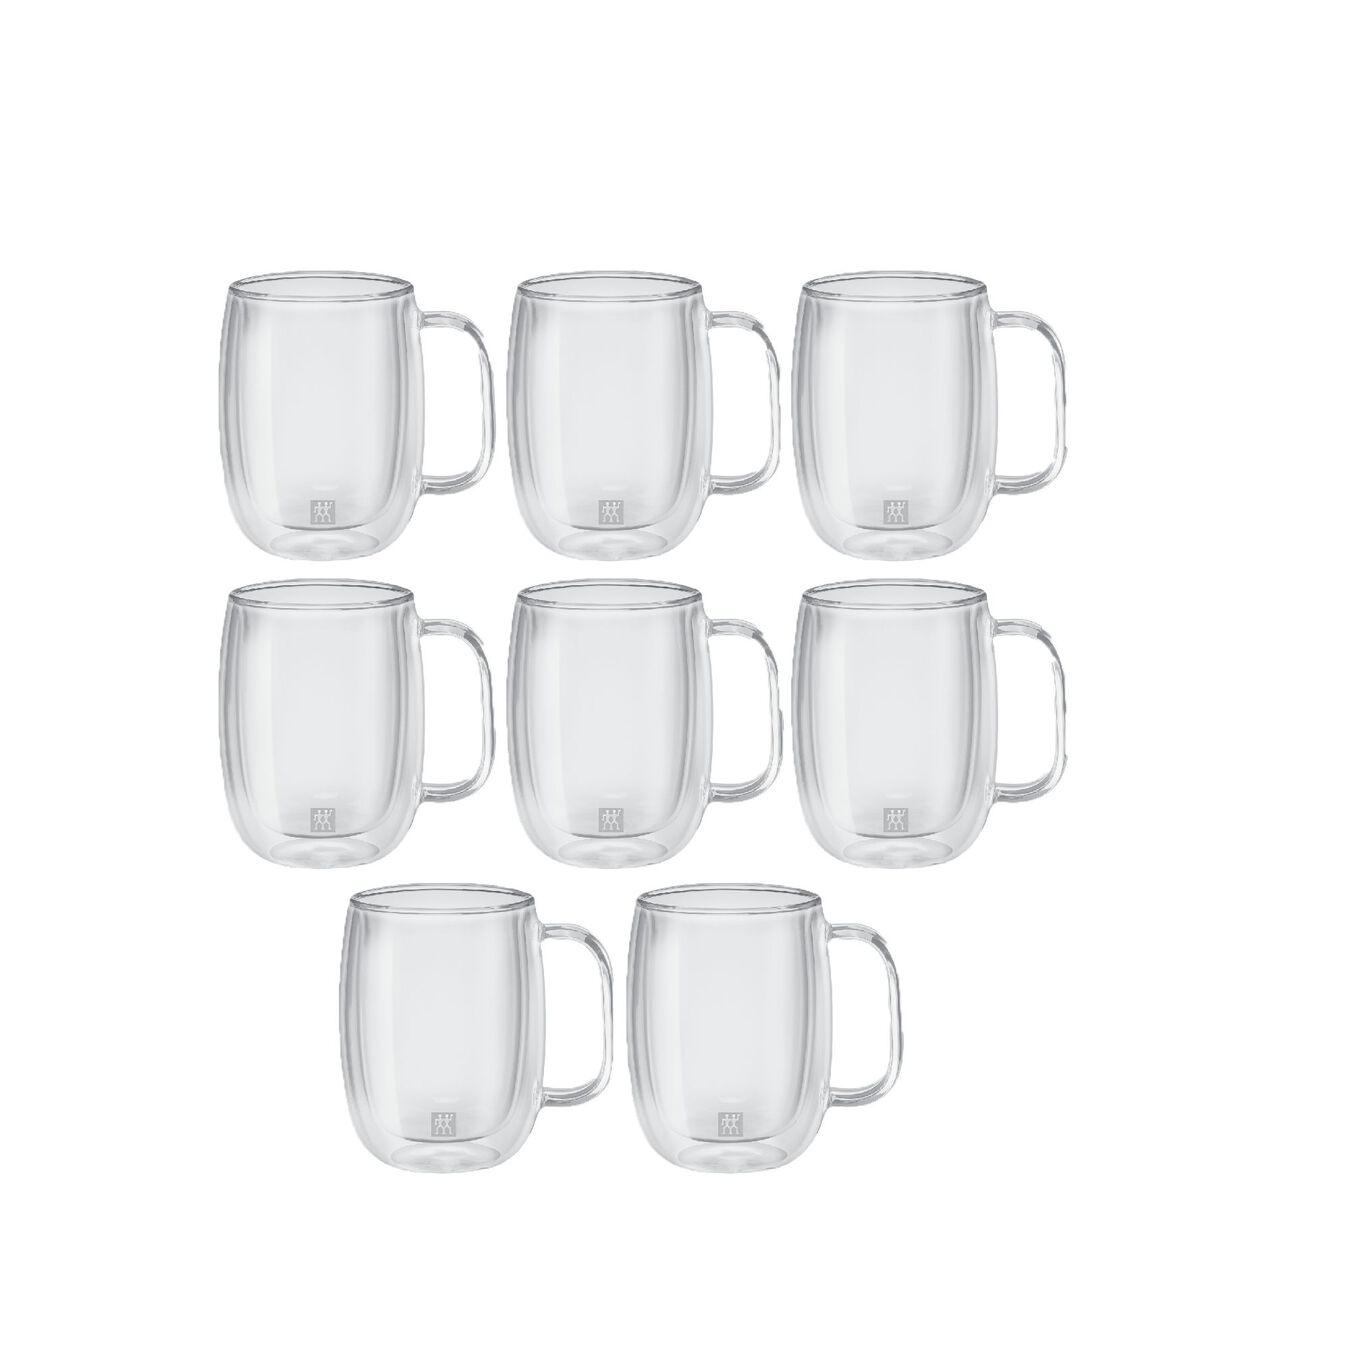 8 Piece Double-Wall Coffee Mug Set,,large 2